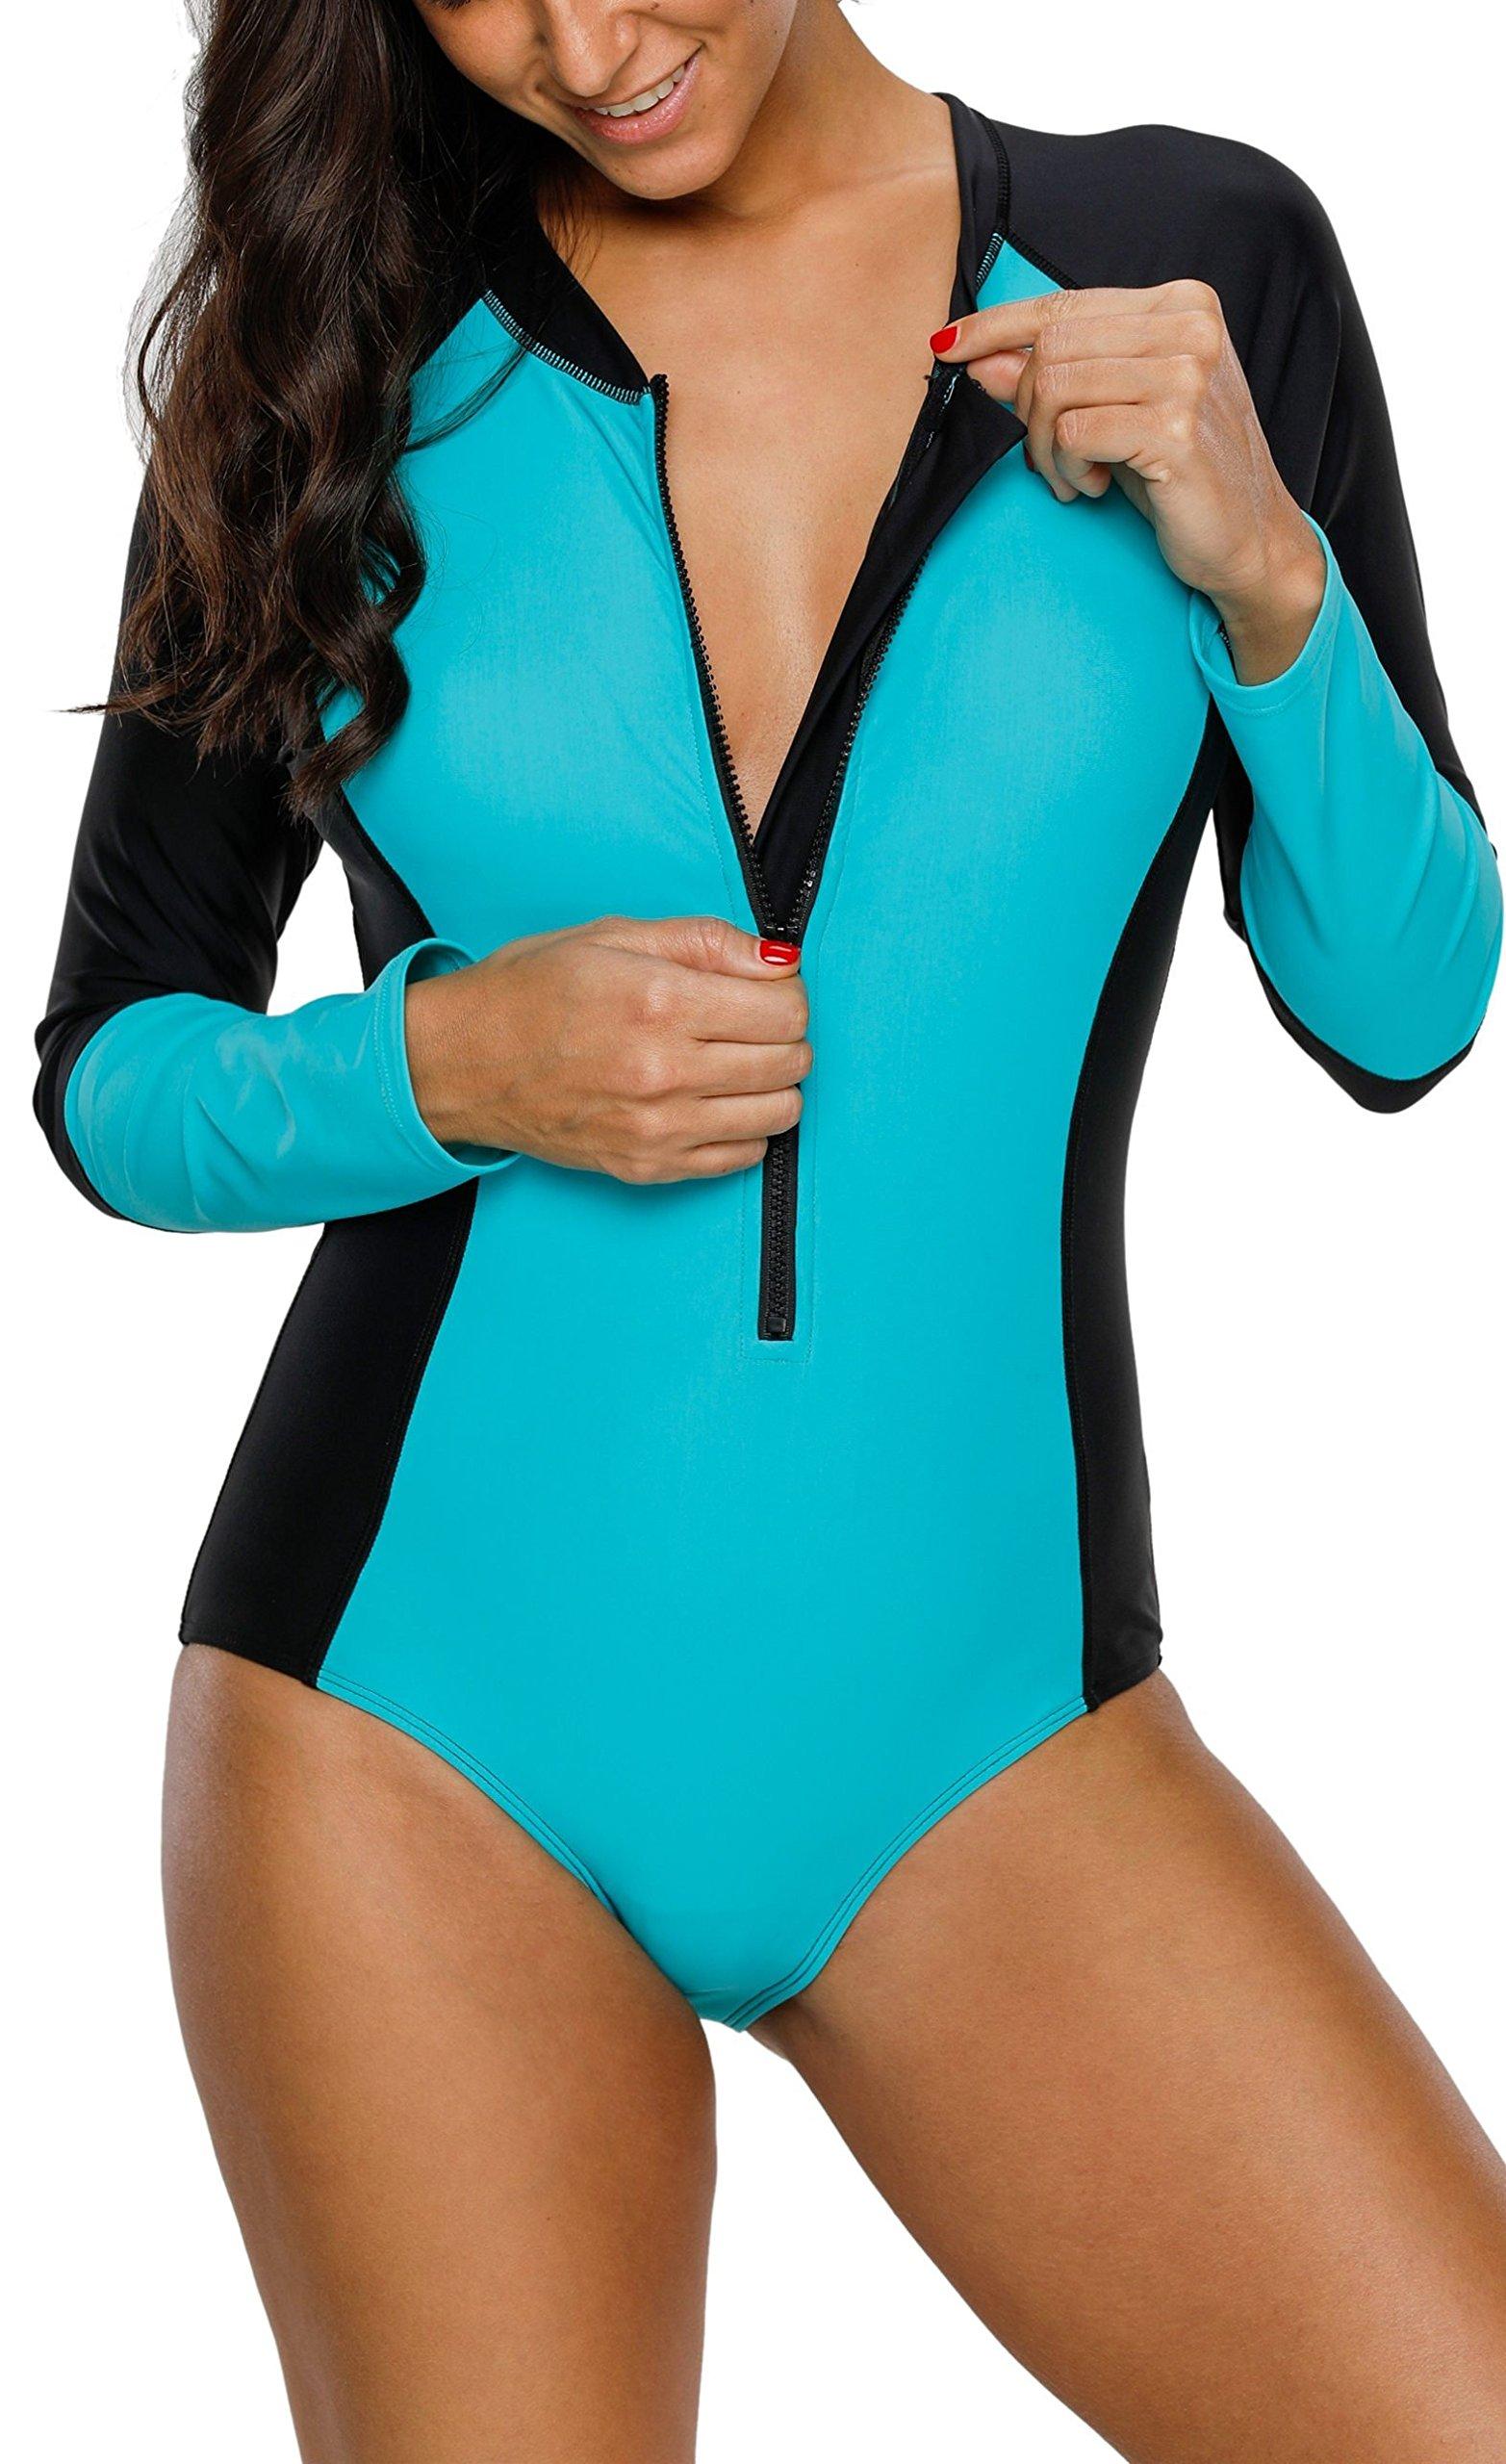 belamo Womens Zip Front Long Sleeve Rashguard Swimsuit UPF 50+ One Piece Swimwear